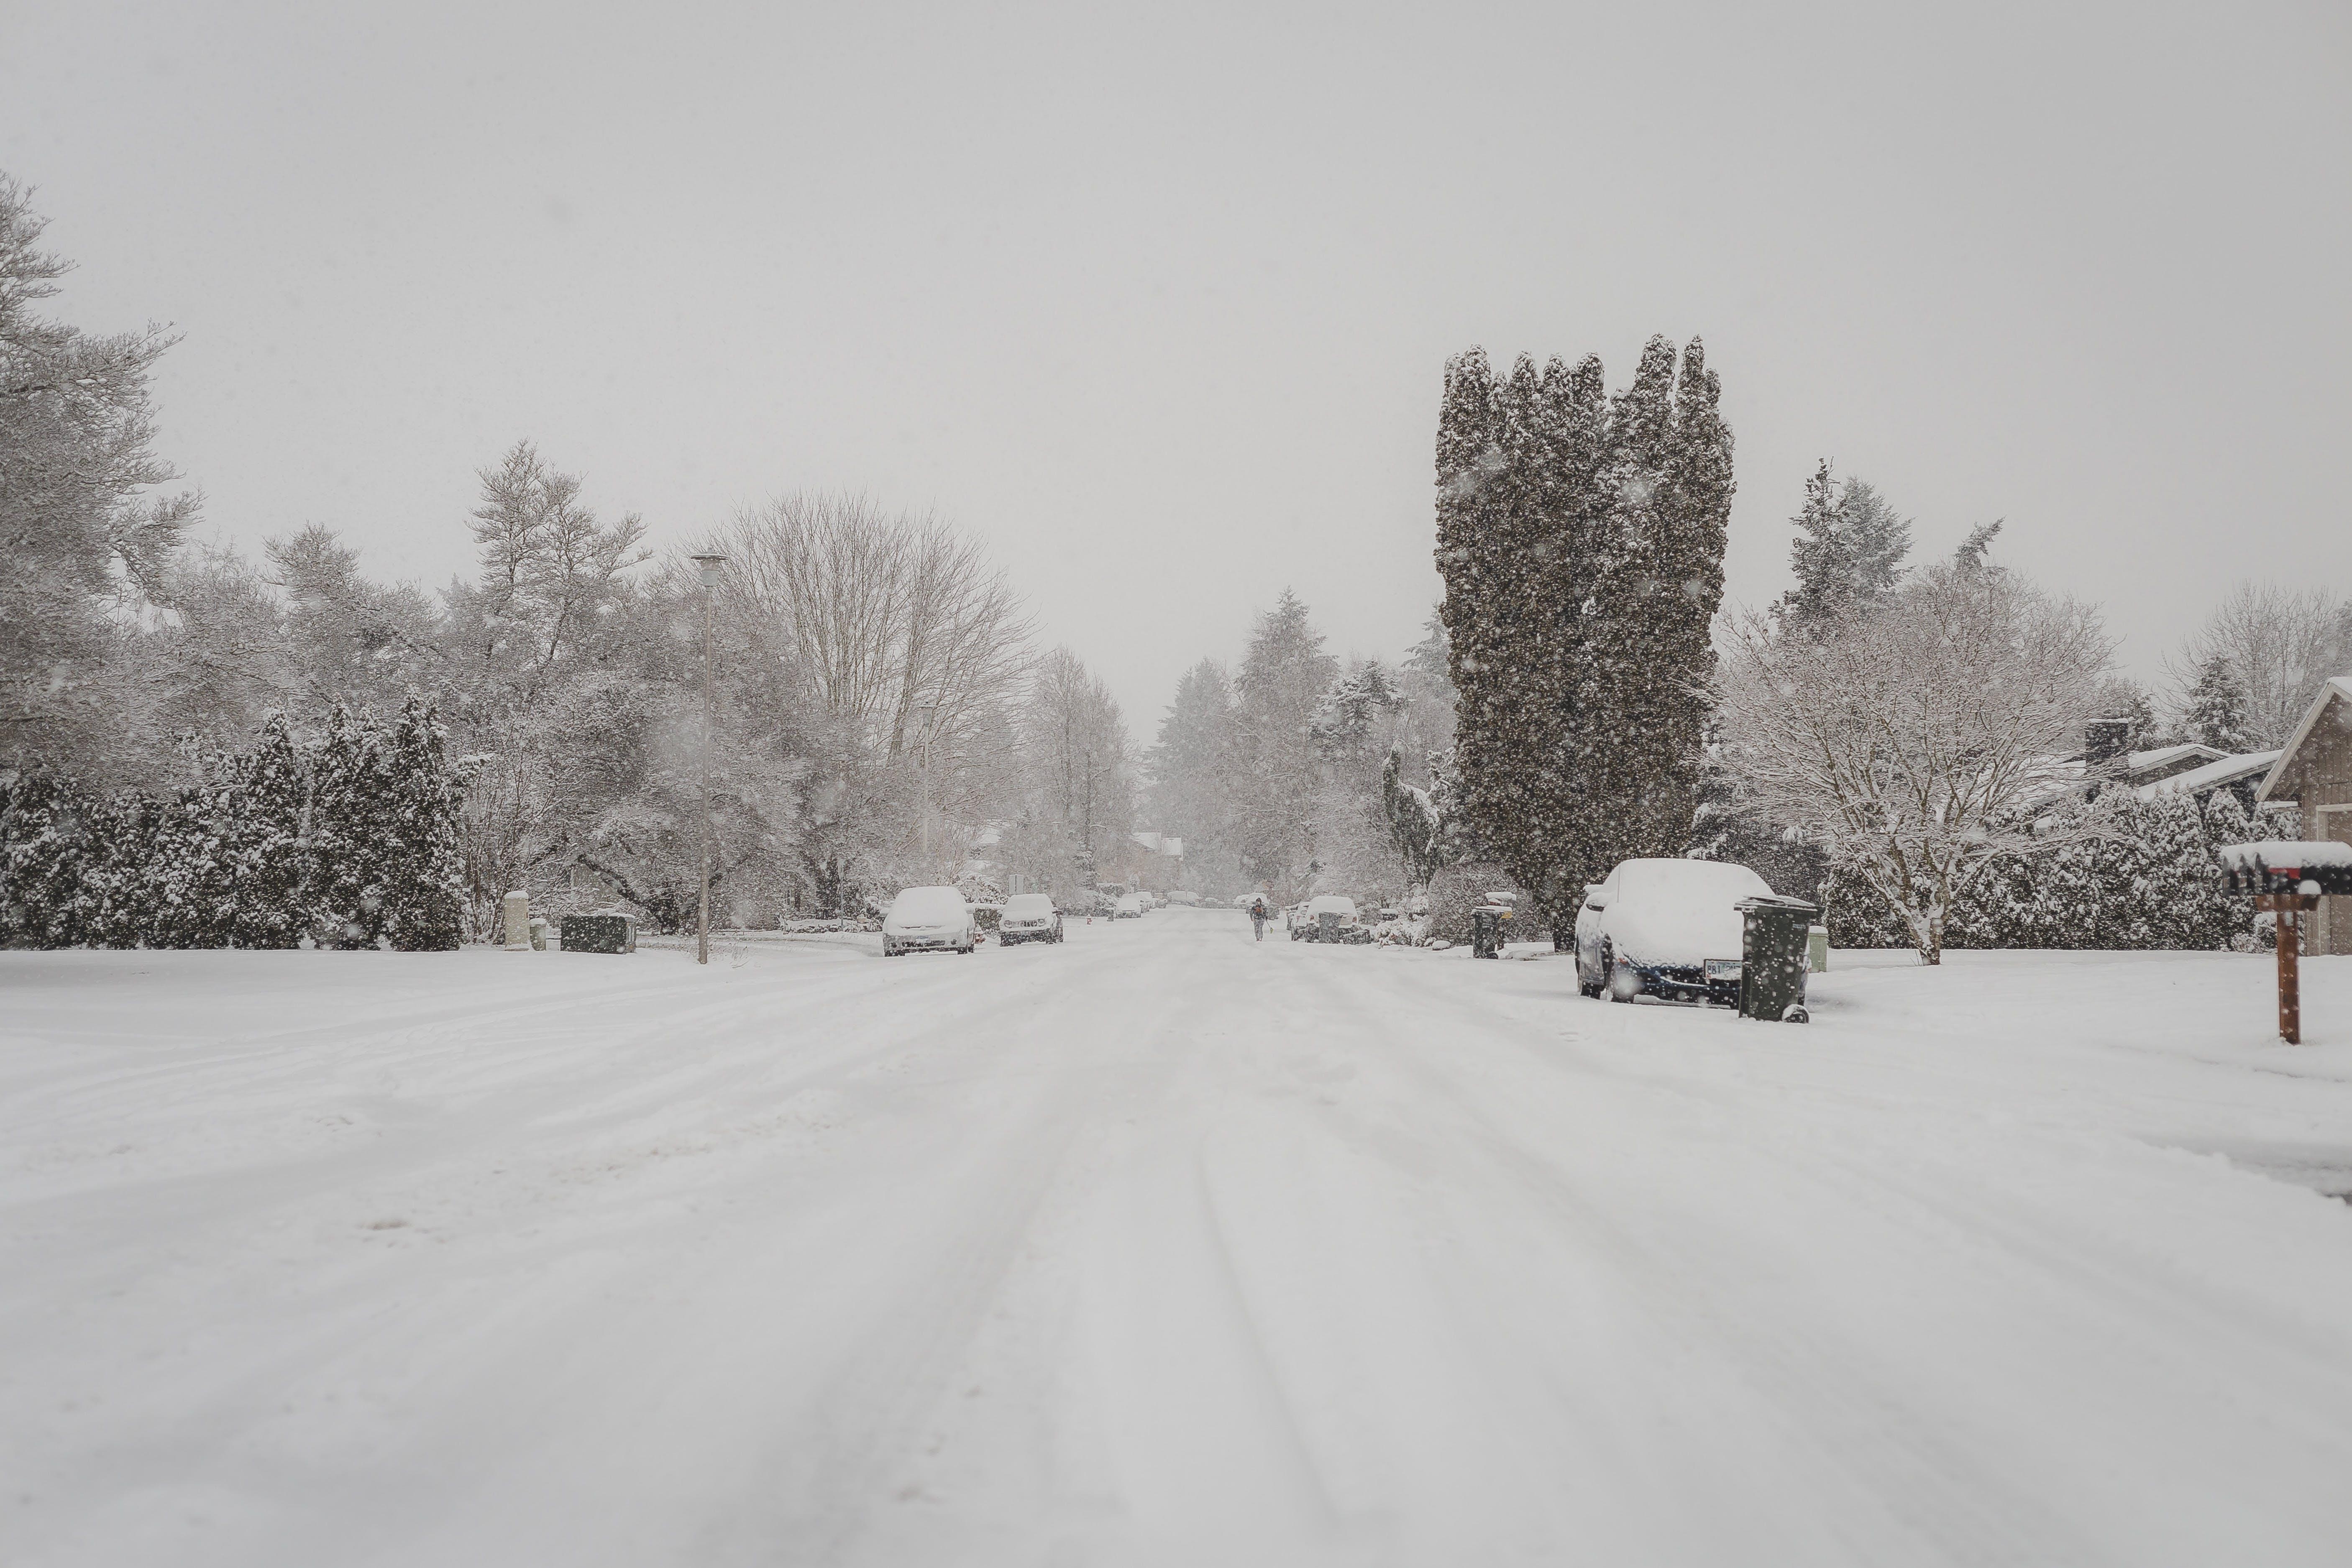 Free stock photo of snow, cars, street, winter